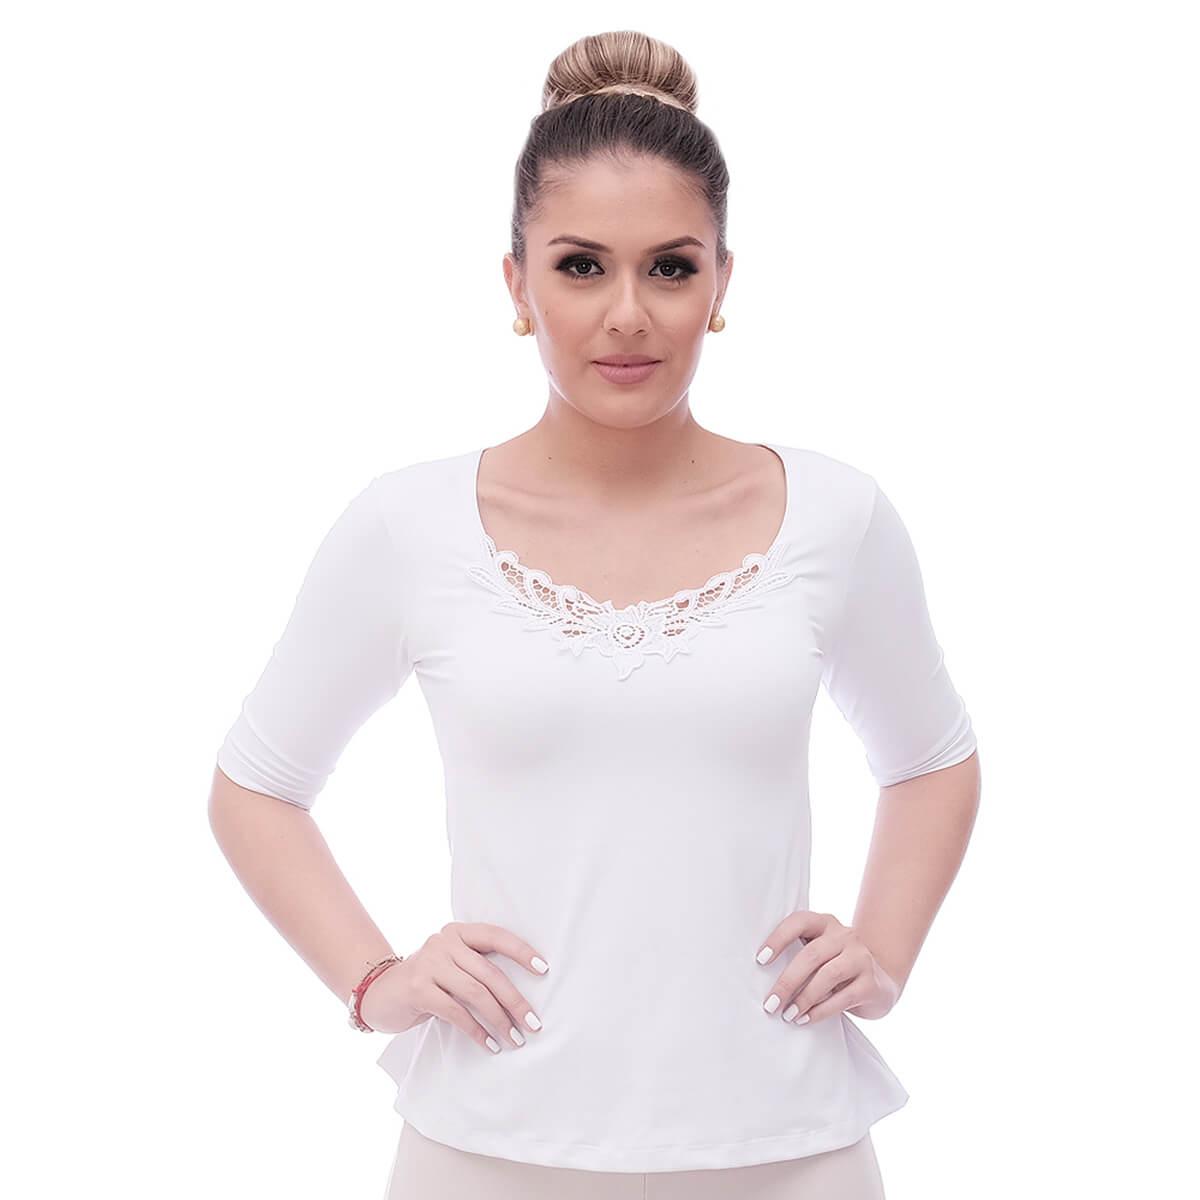 Blusa Feminina Meia Manga Branca Decote Redondo Evasê com Renda Guipir Branca